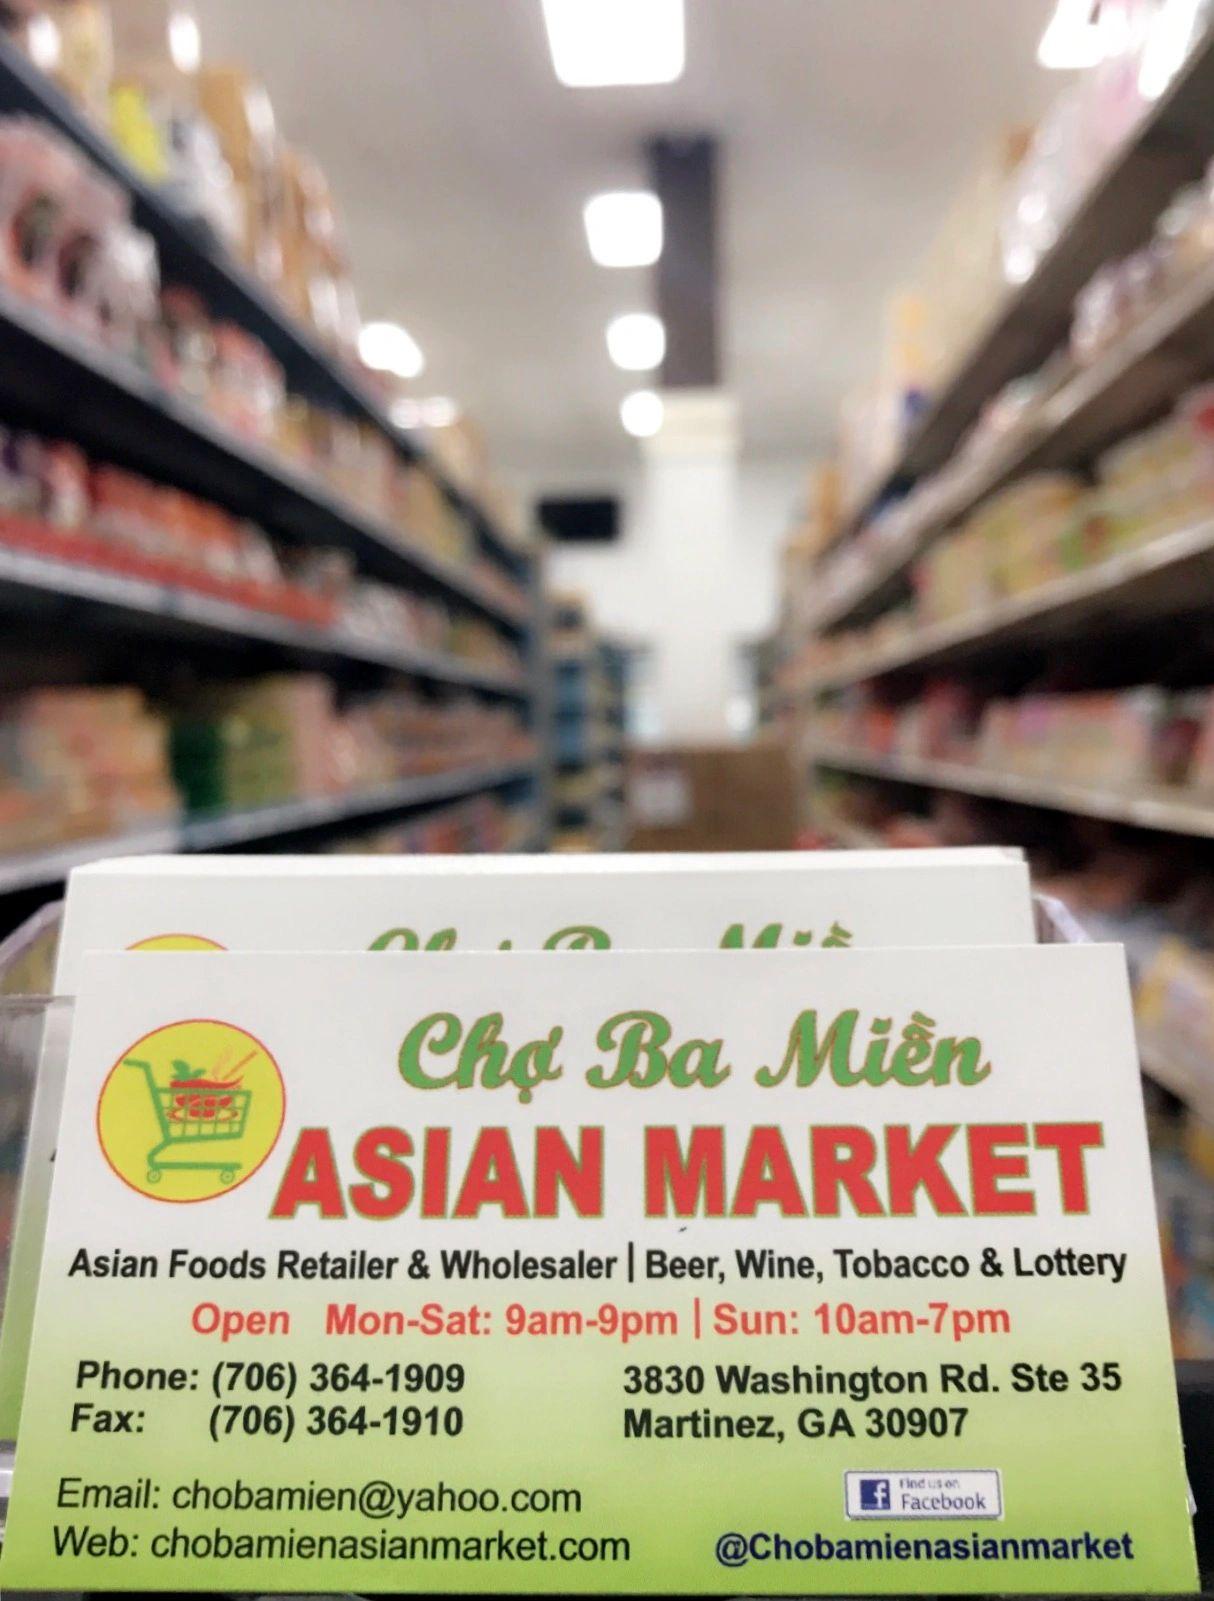 Cho Ba Mien Asian Market